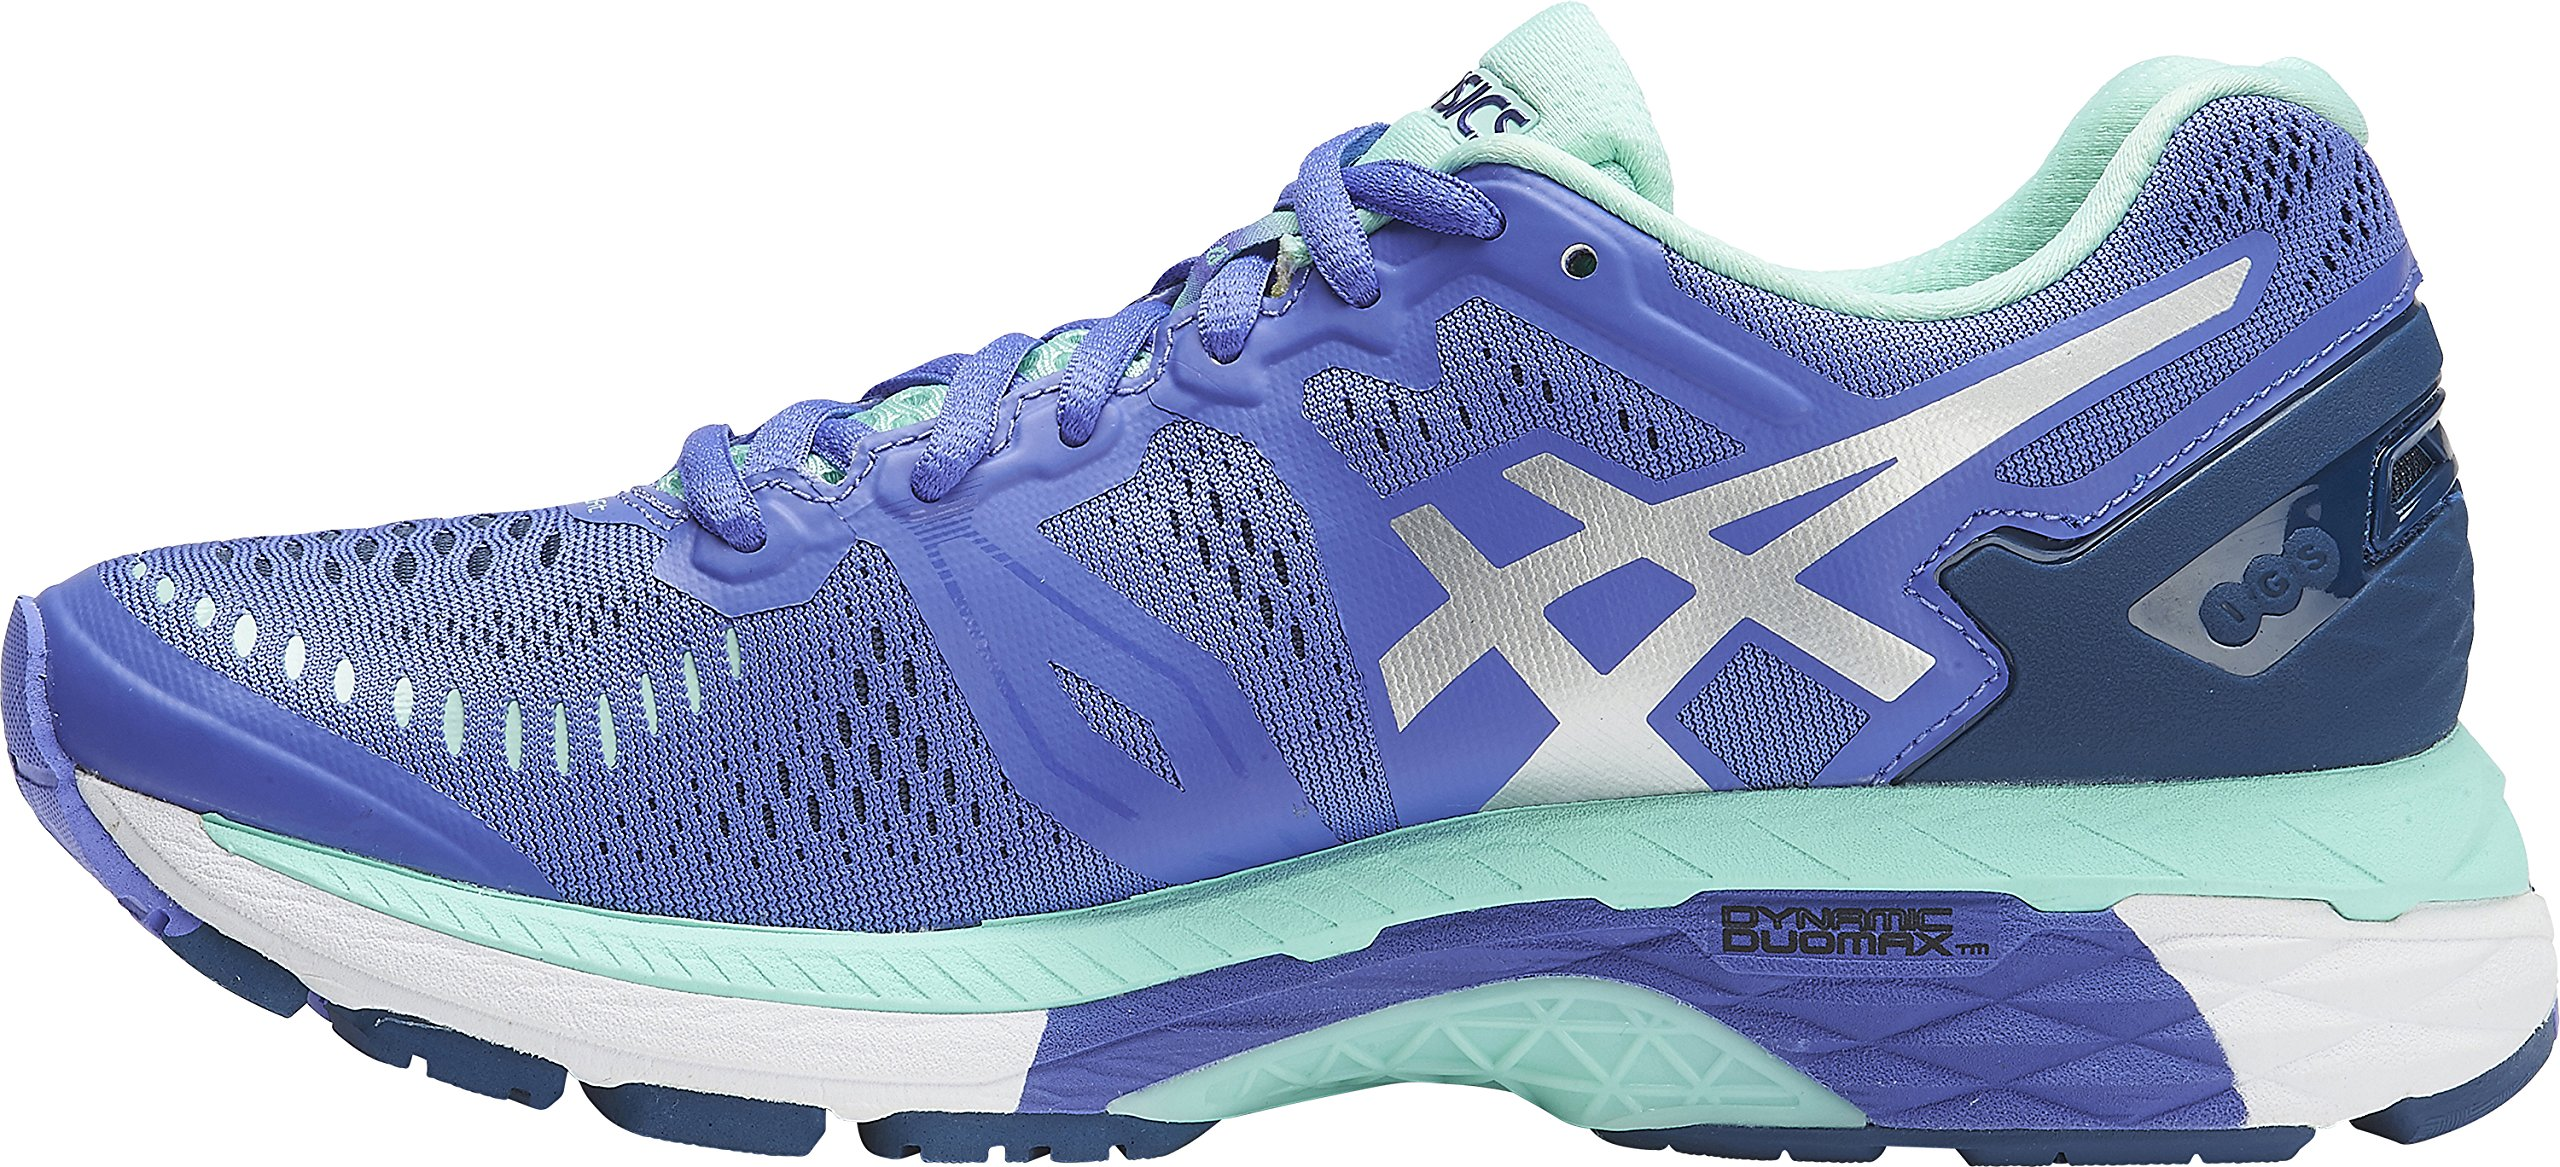 ASICS Womens Gel-Kayano 23 Running Shoe, Purple/Silver/Mint, 10 B(M) US